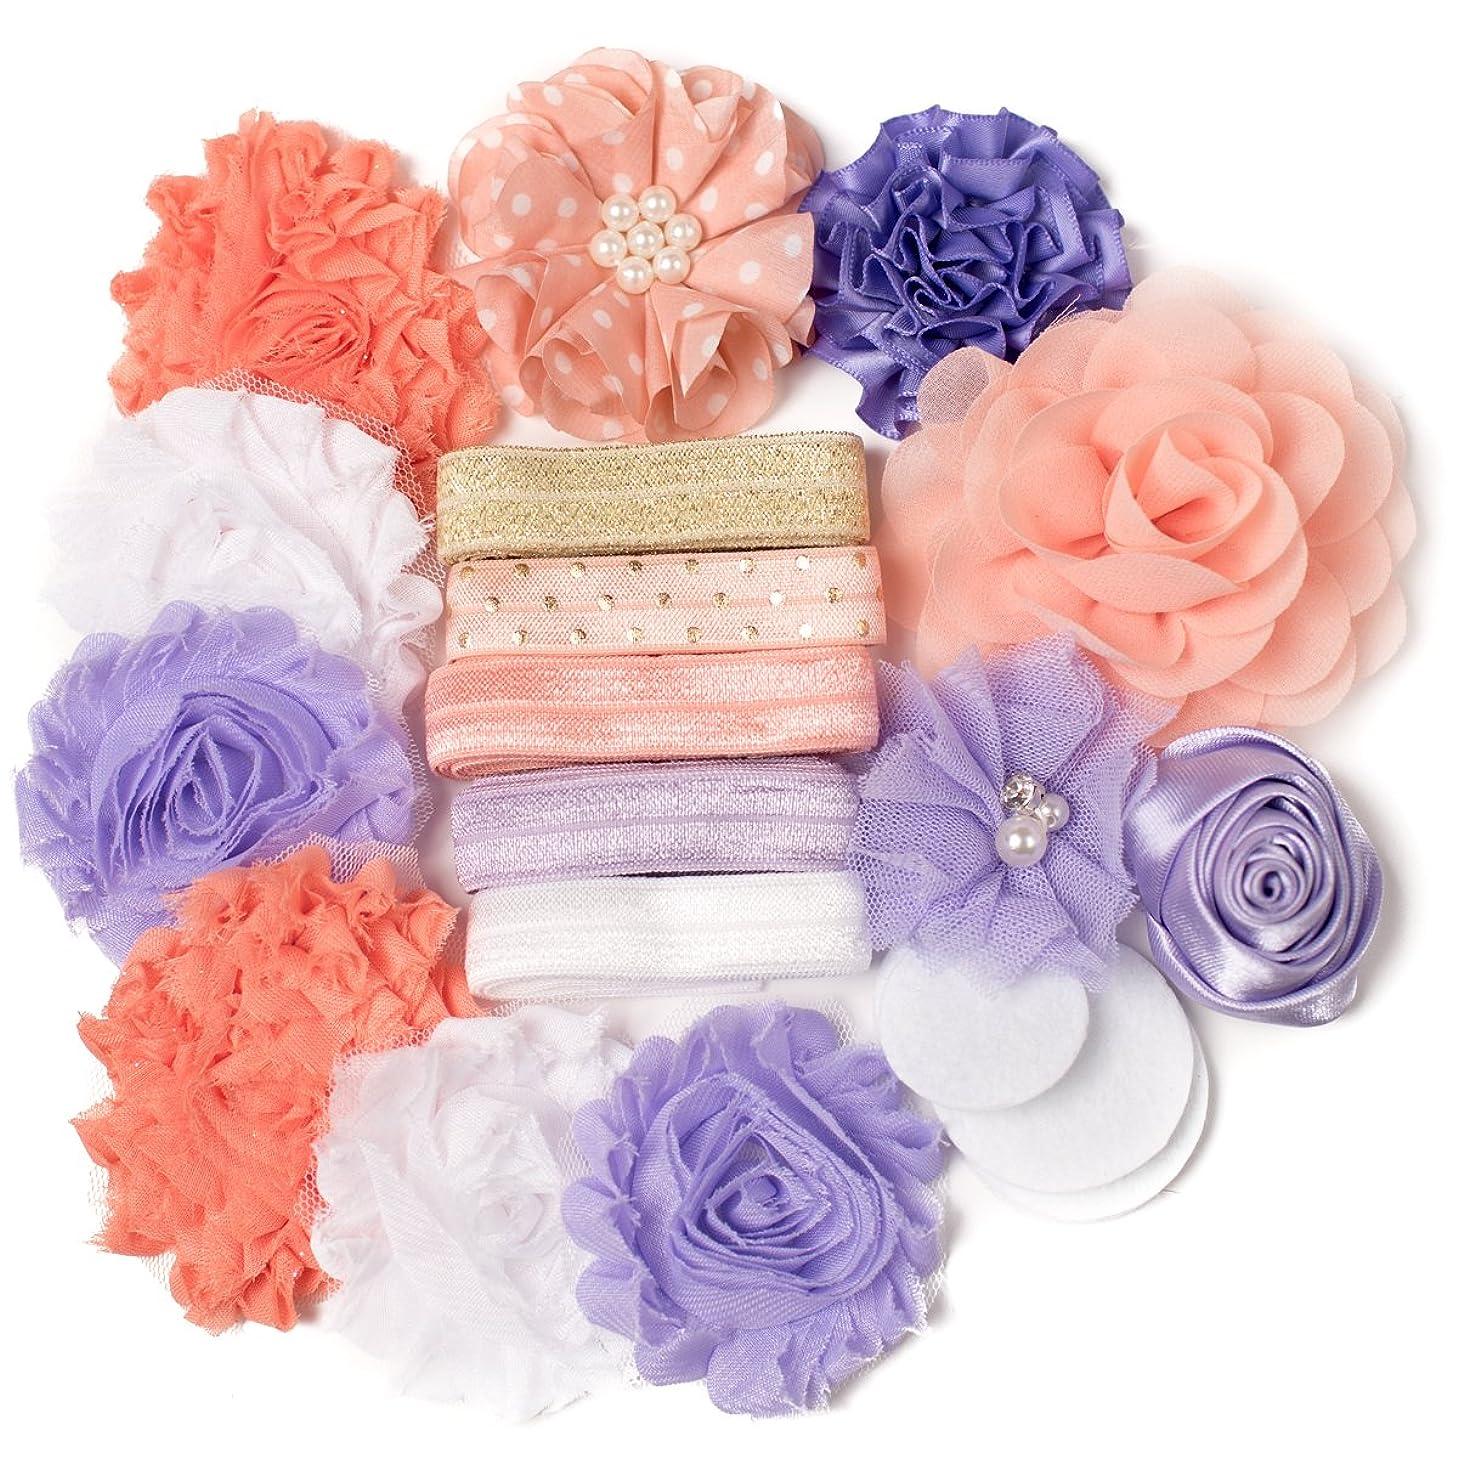 Whimsy : Peach & Lavender Purple DIY Deluxe Mini Headband Kit Makes 5-10 Headband Hair Accessories : Shabby Chiffon Craft Roses FOE Fold Over Elastic : Princess Parties & Baby Showers